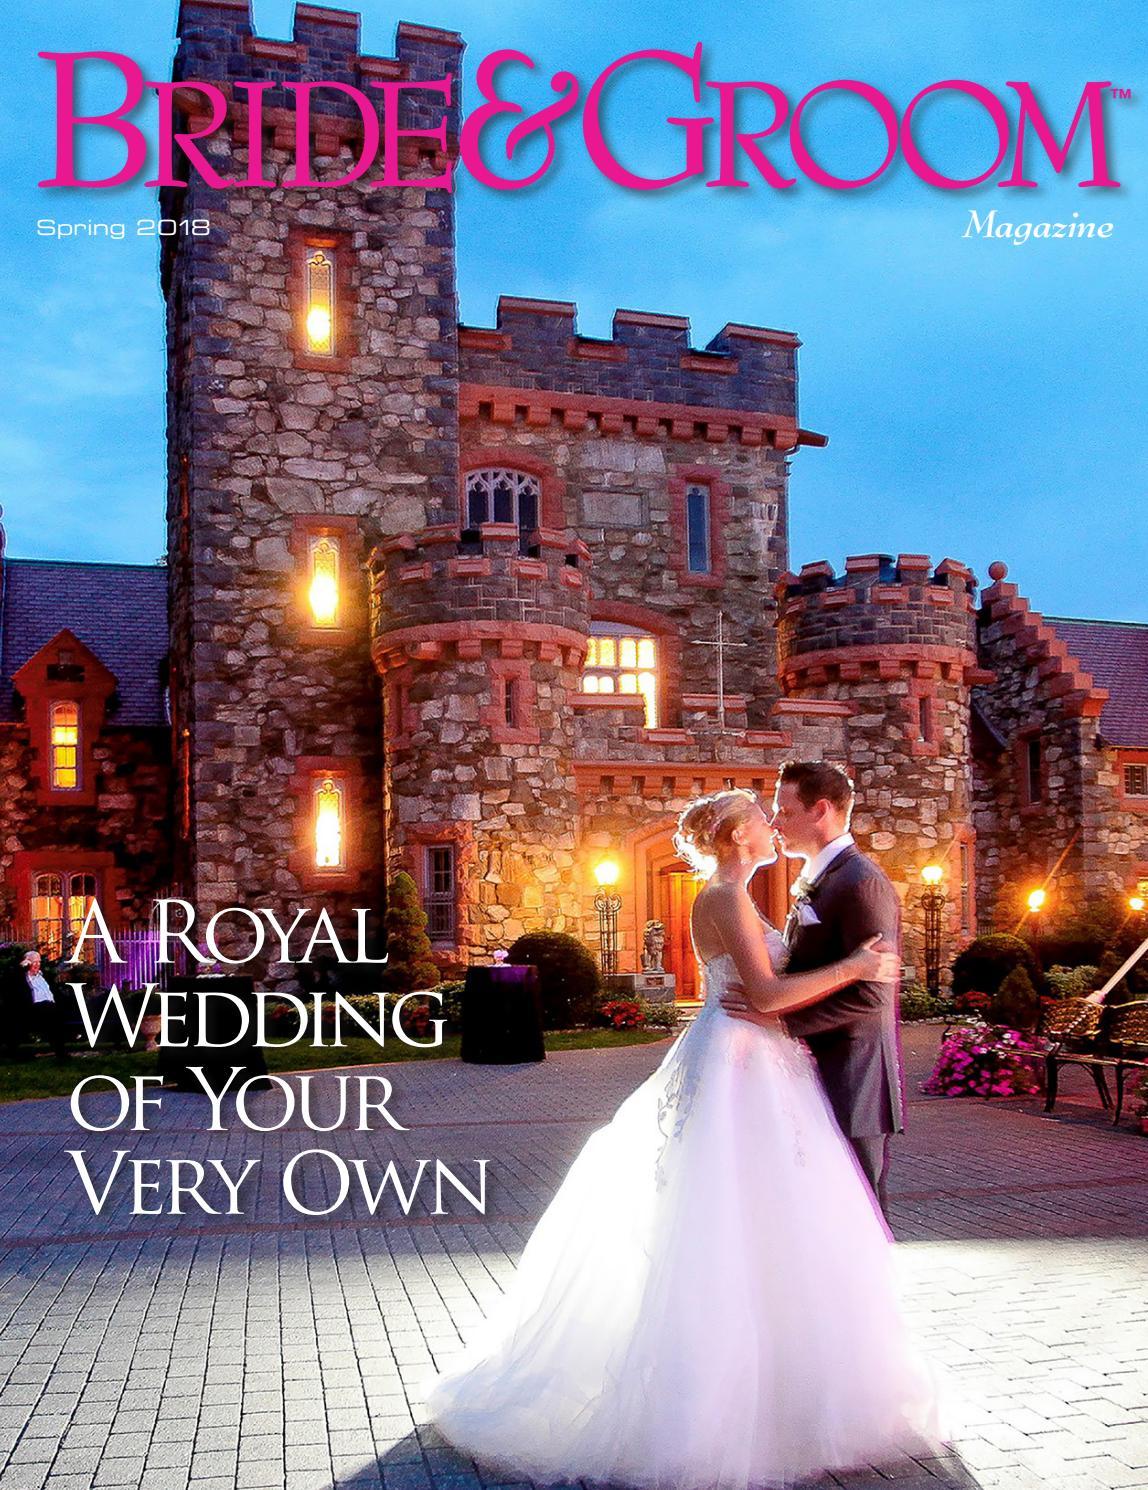 Bride & Groom Spring 2018 by Bride & Groom Magazine - issuu